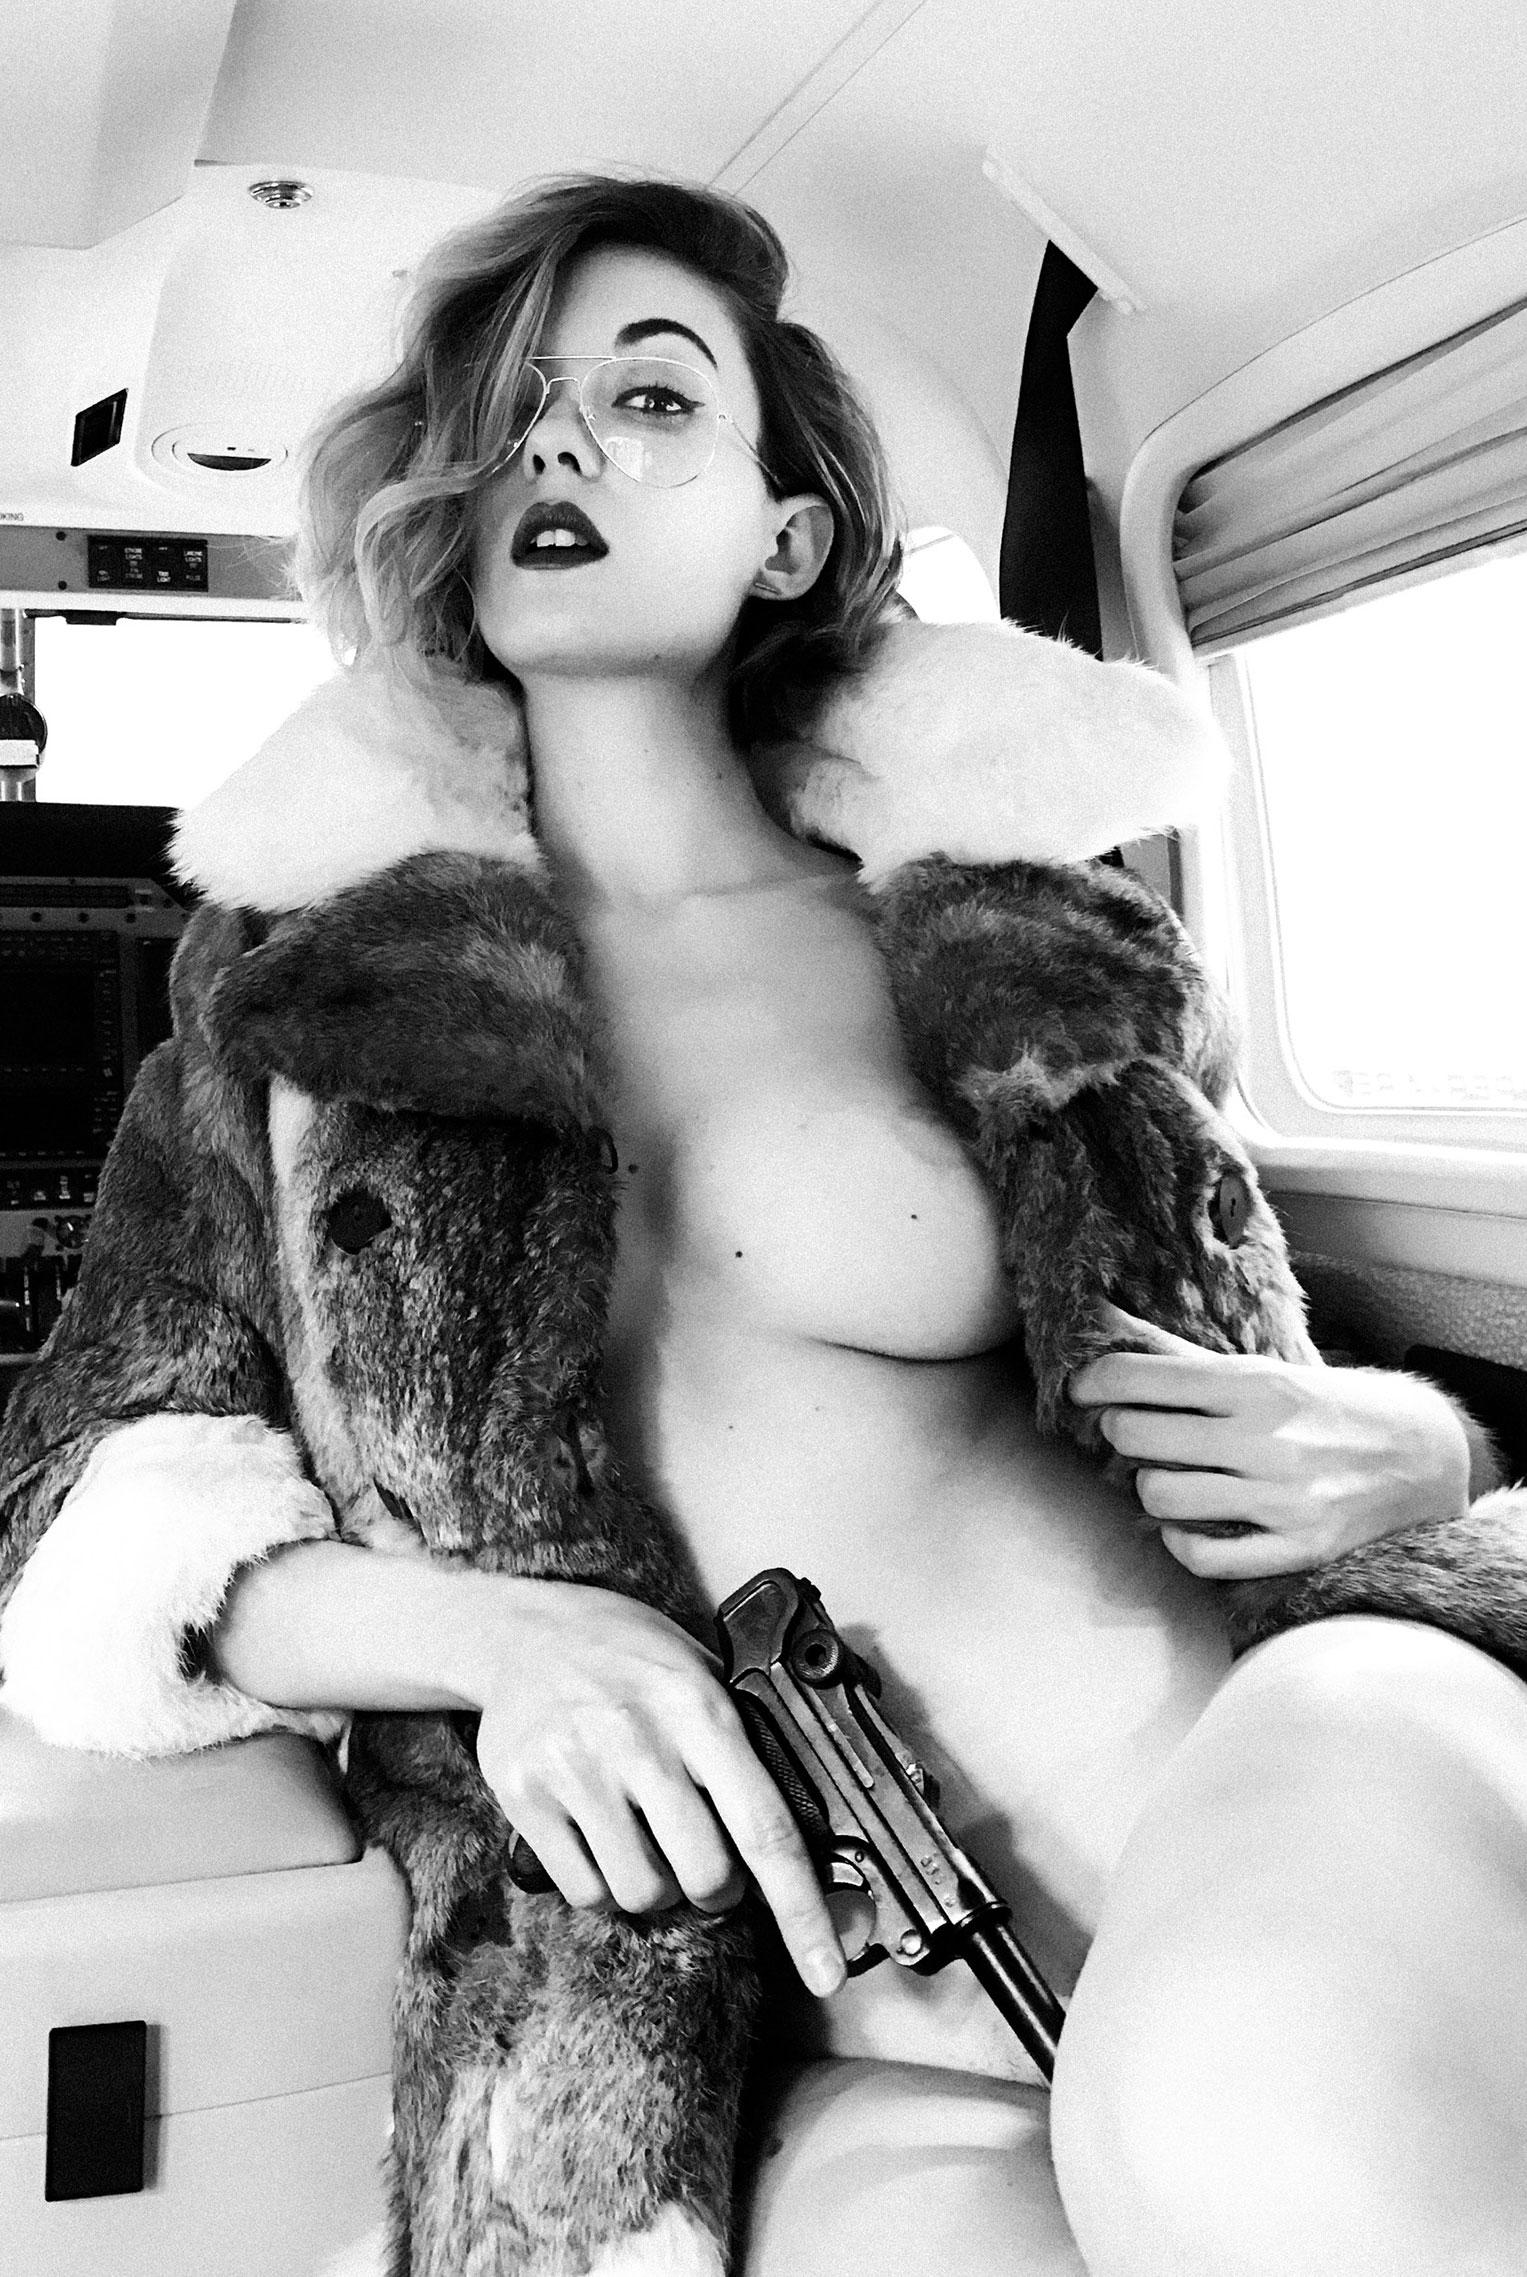 сексуальная угонщица самолета Анна-Лиза / фото 13